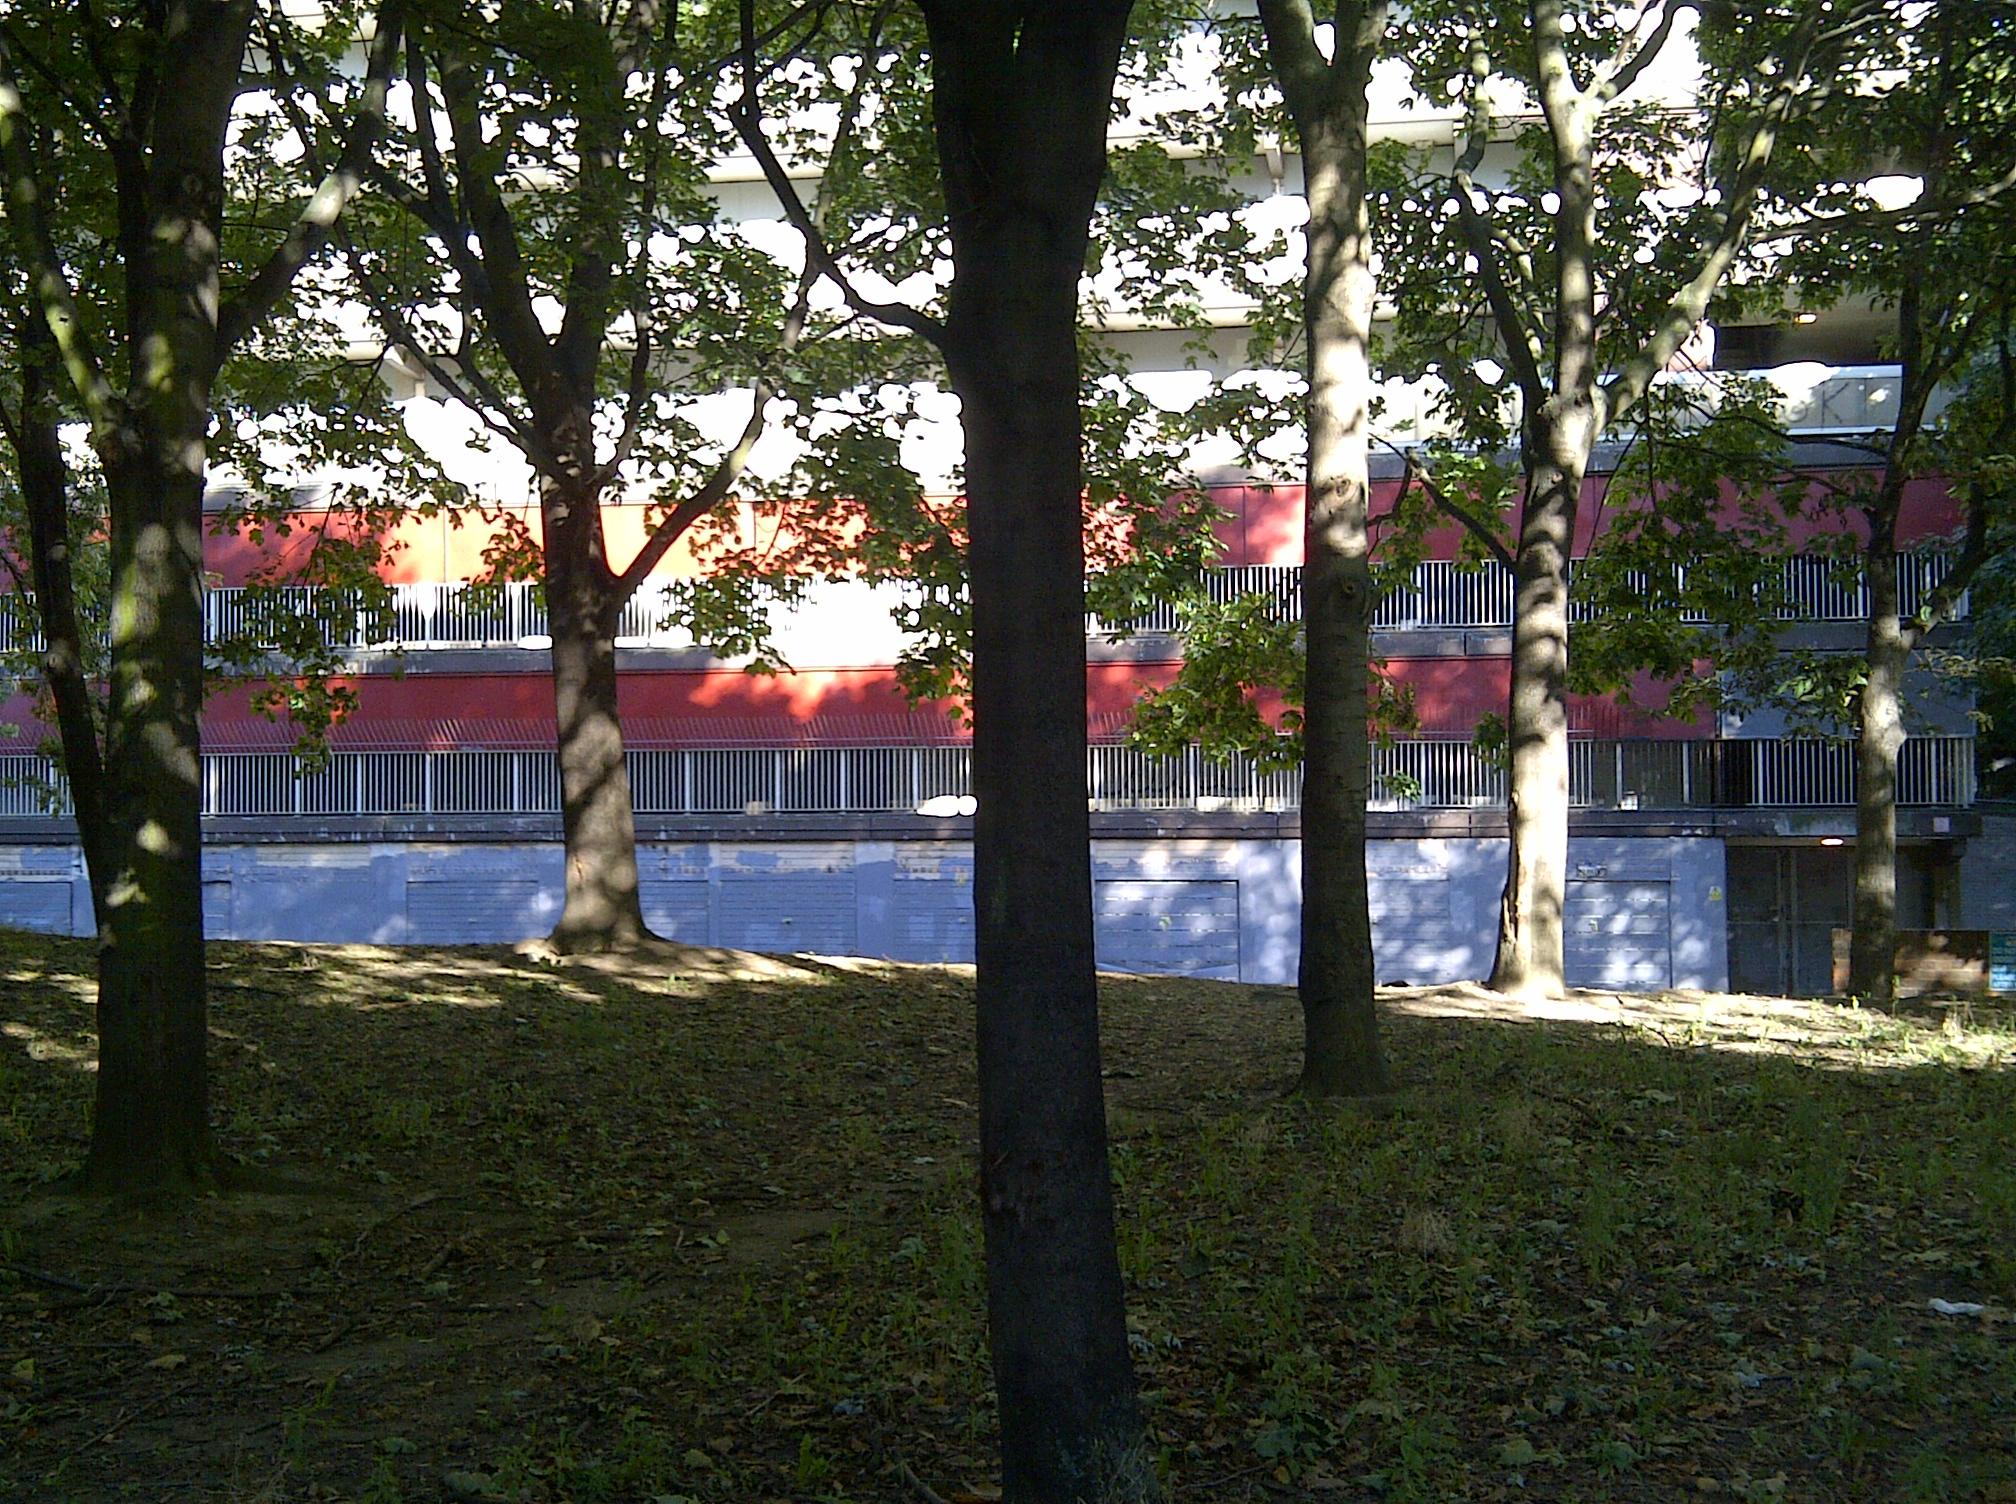 IMG-20120907-00546